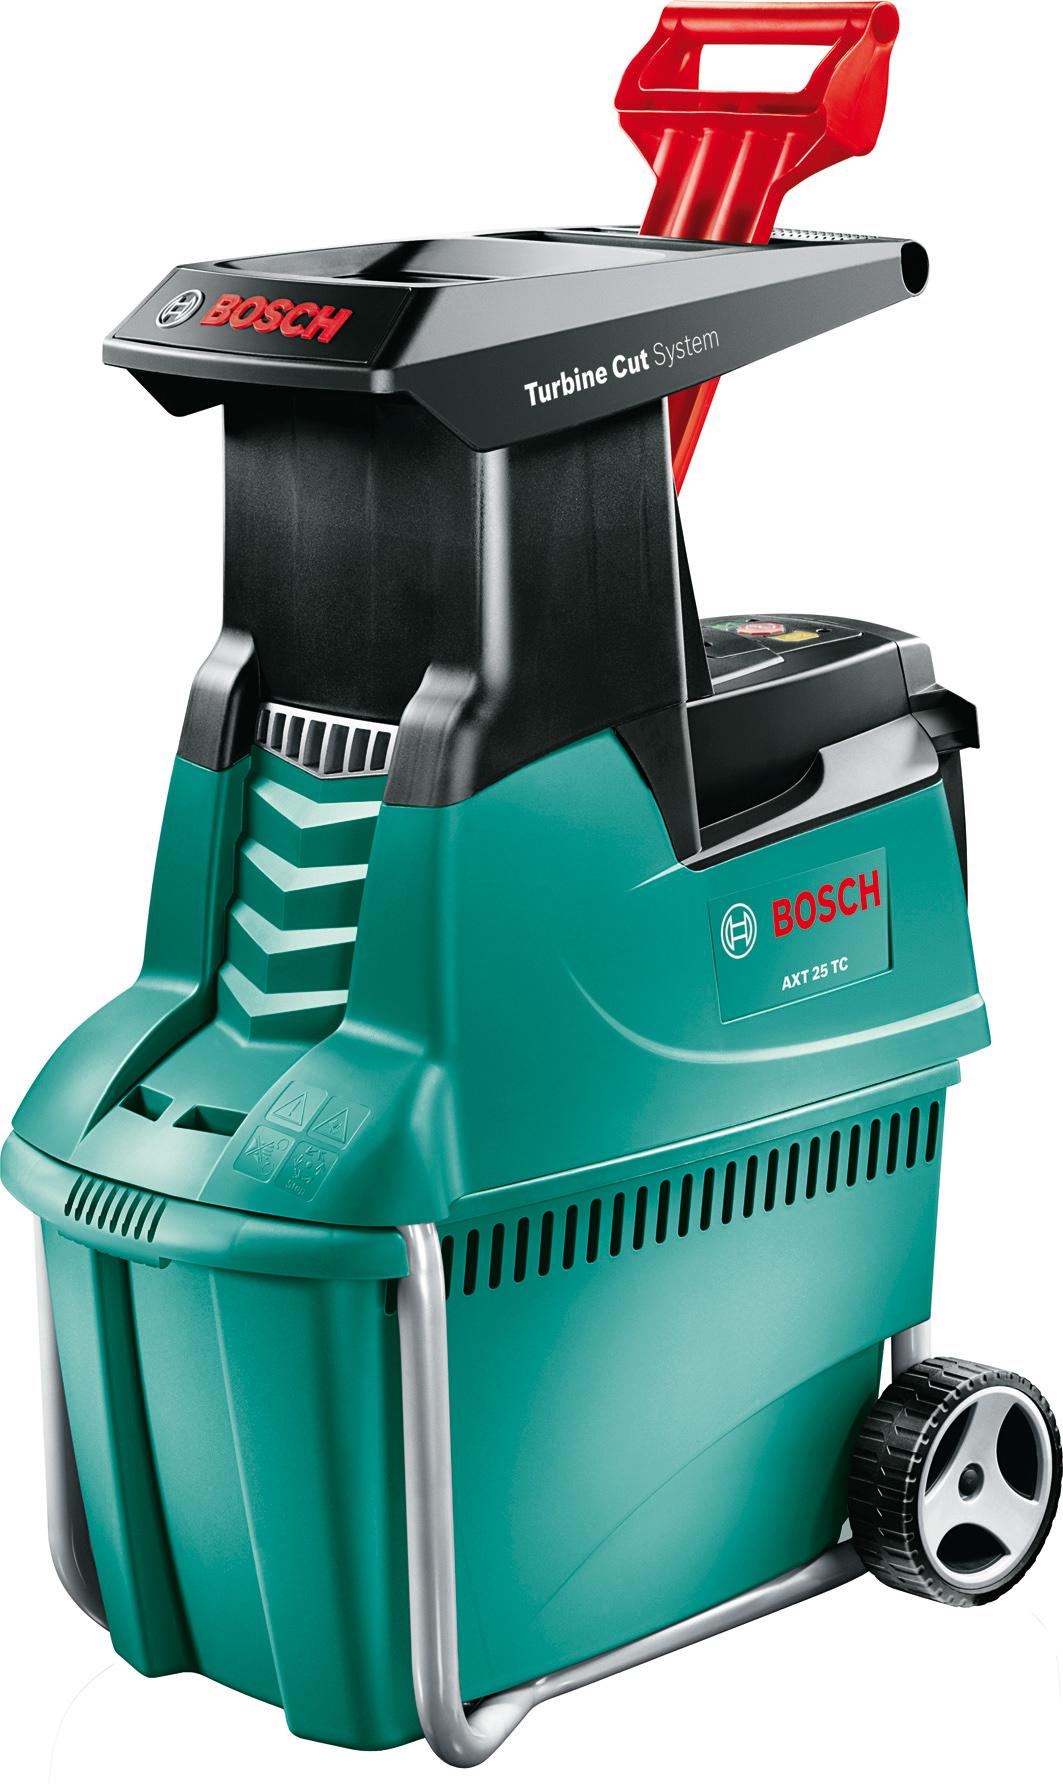 Bosch Garden Electric Shredder AXT 25TC